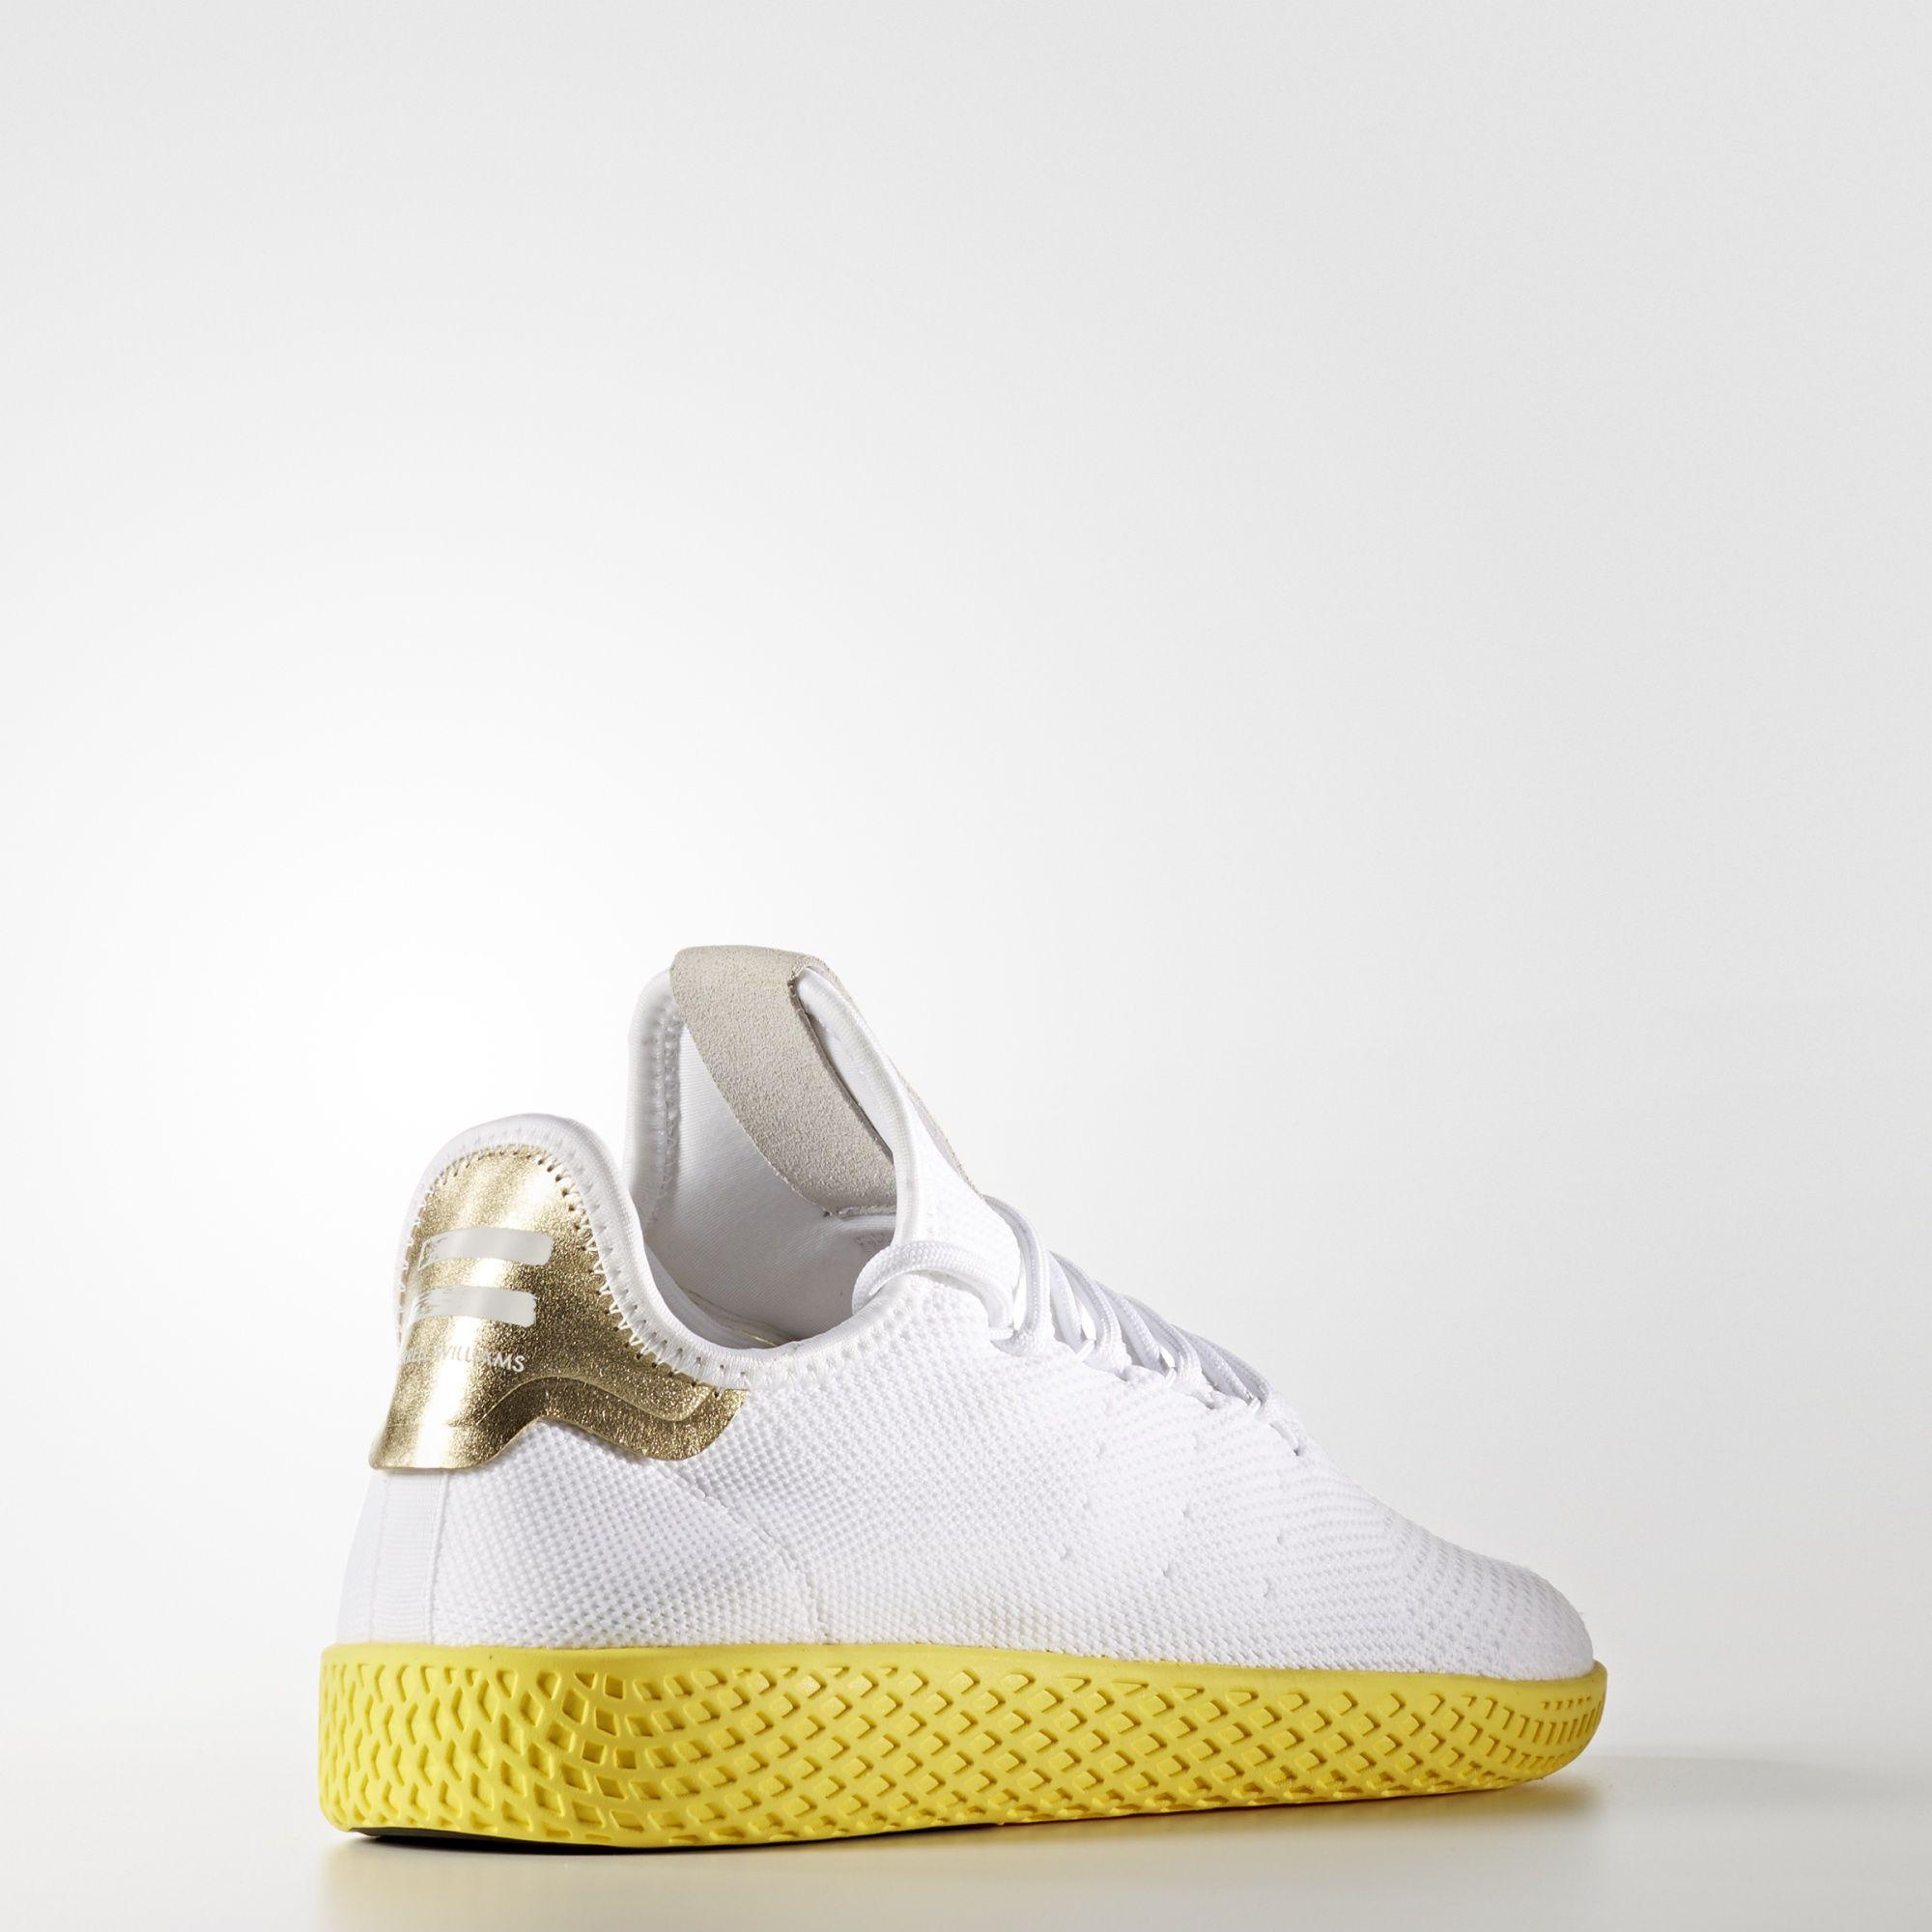 Pharrell Williams x adidas Tennis HU Primeknit Yellow BY2674 3